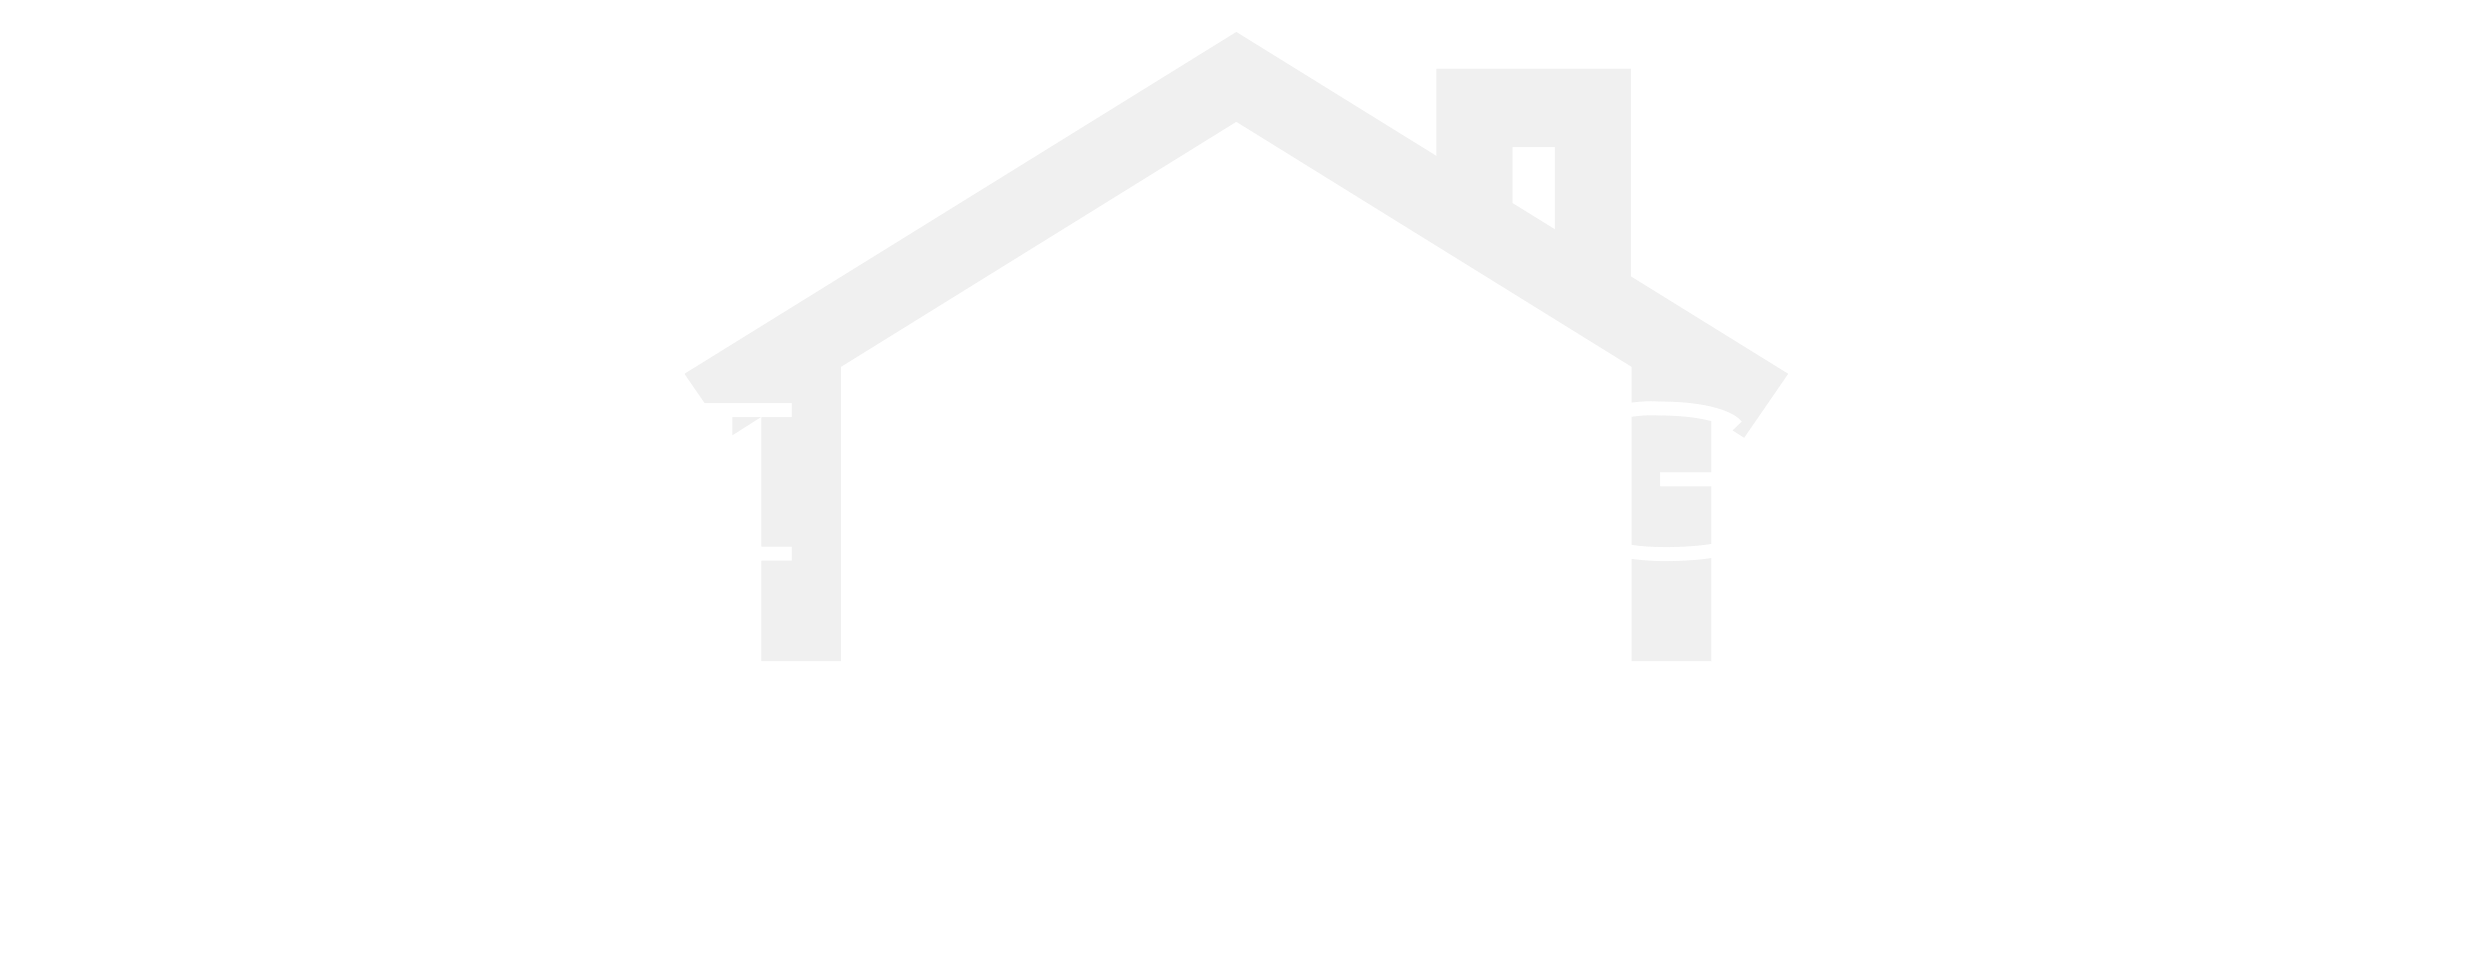 Real Estate Ryan Ditmar Lineage Real Estate